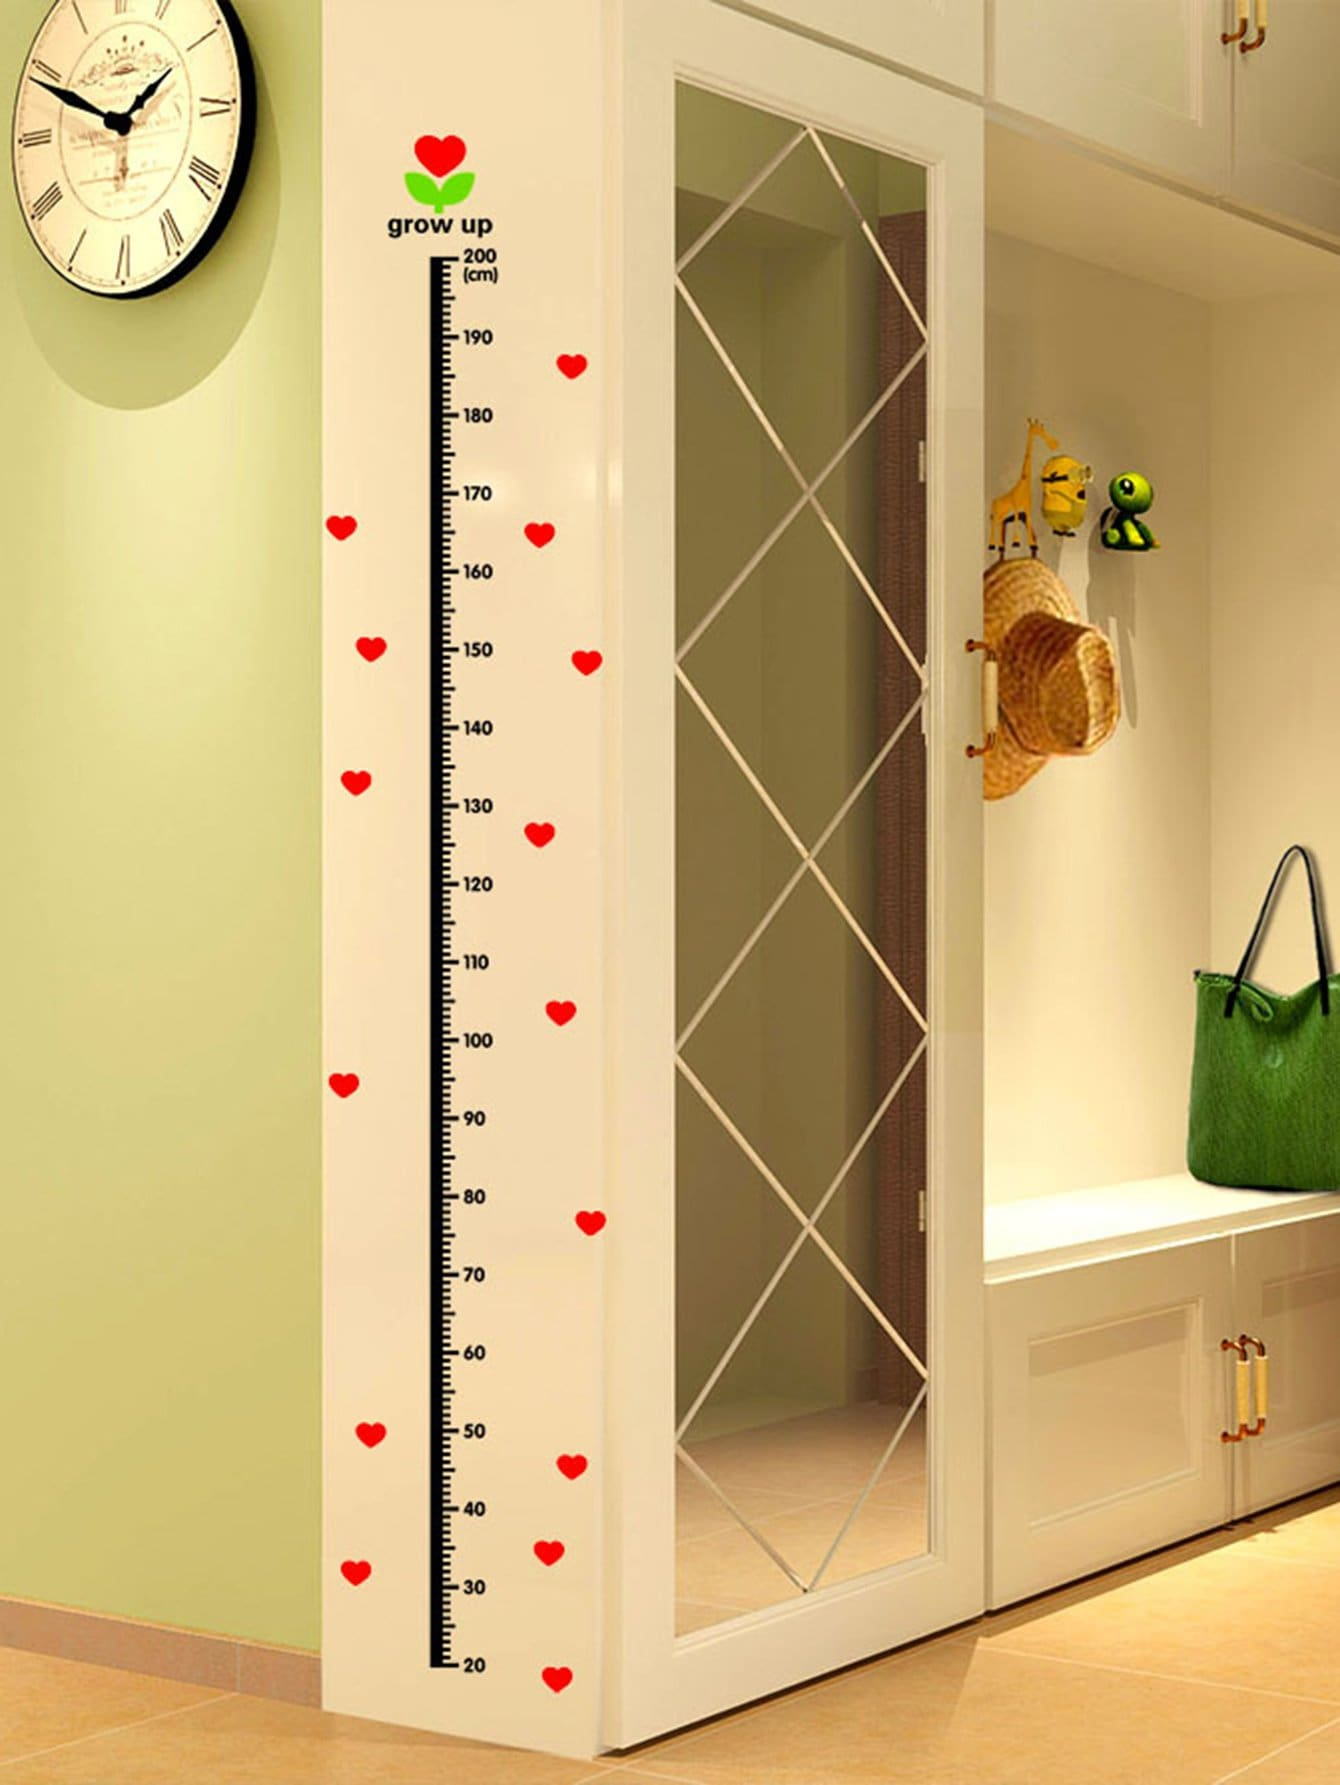 Height Chart Wall Sticker chart throb